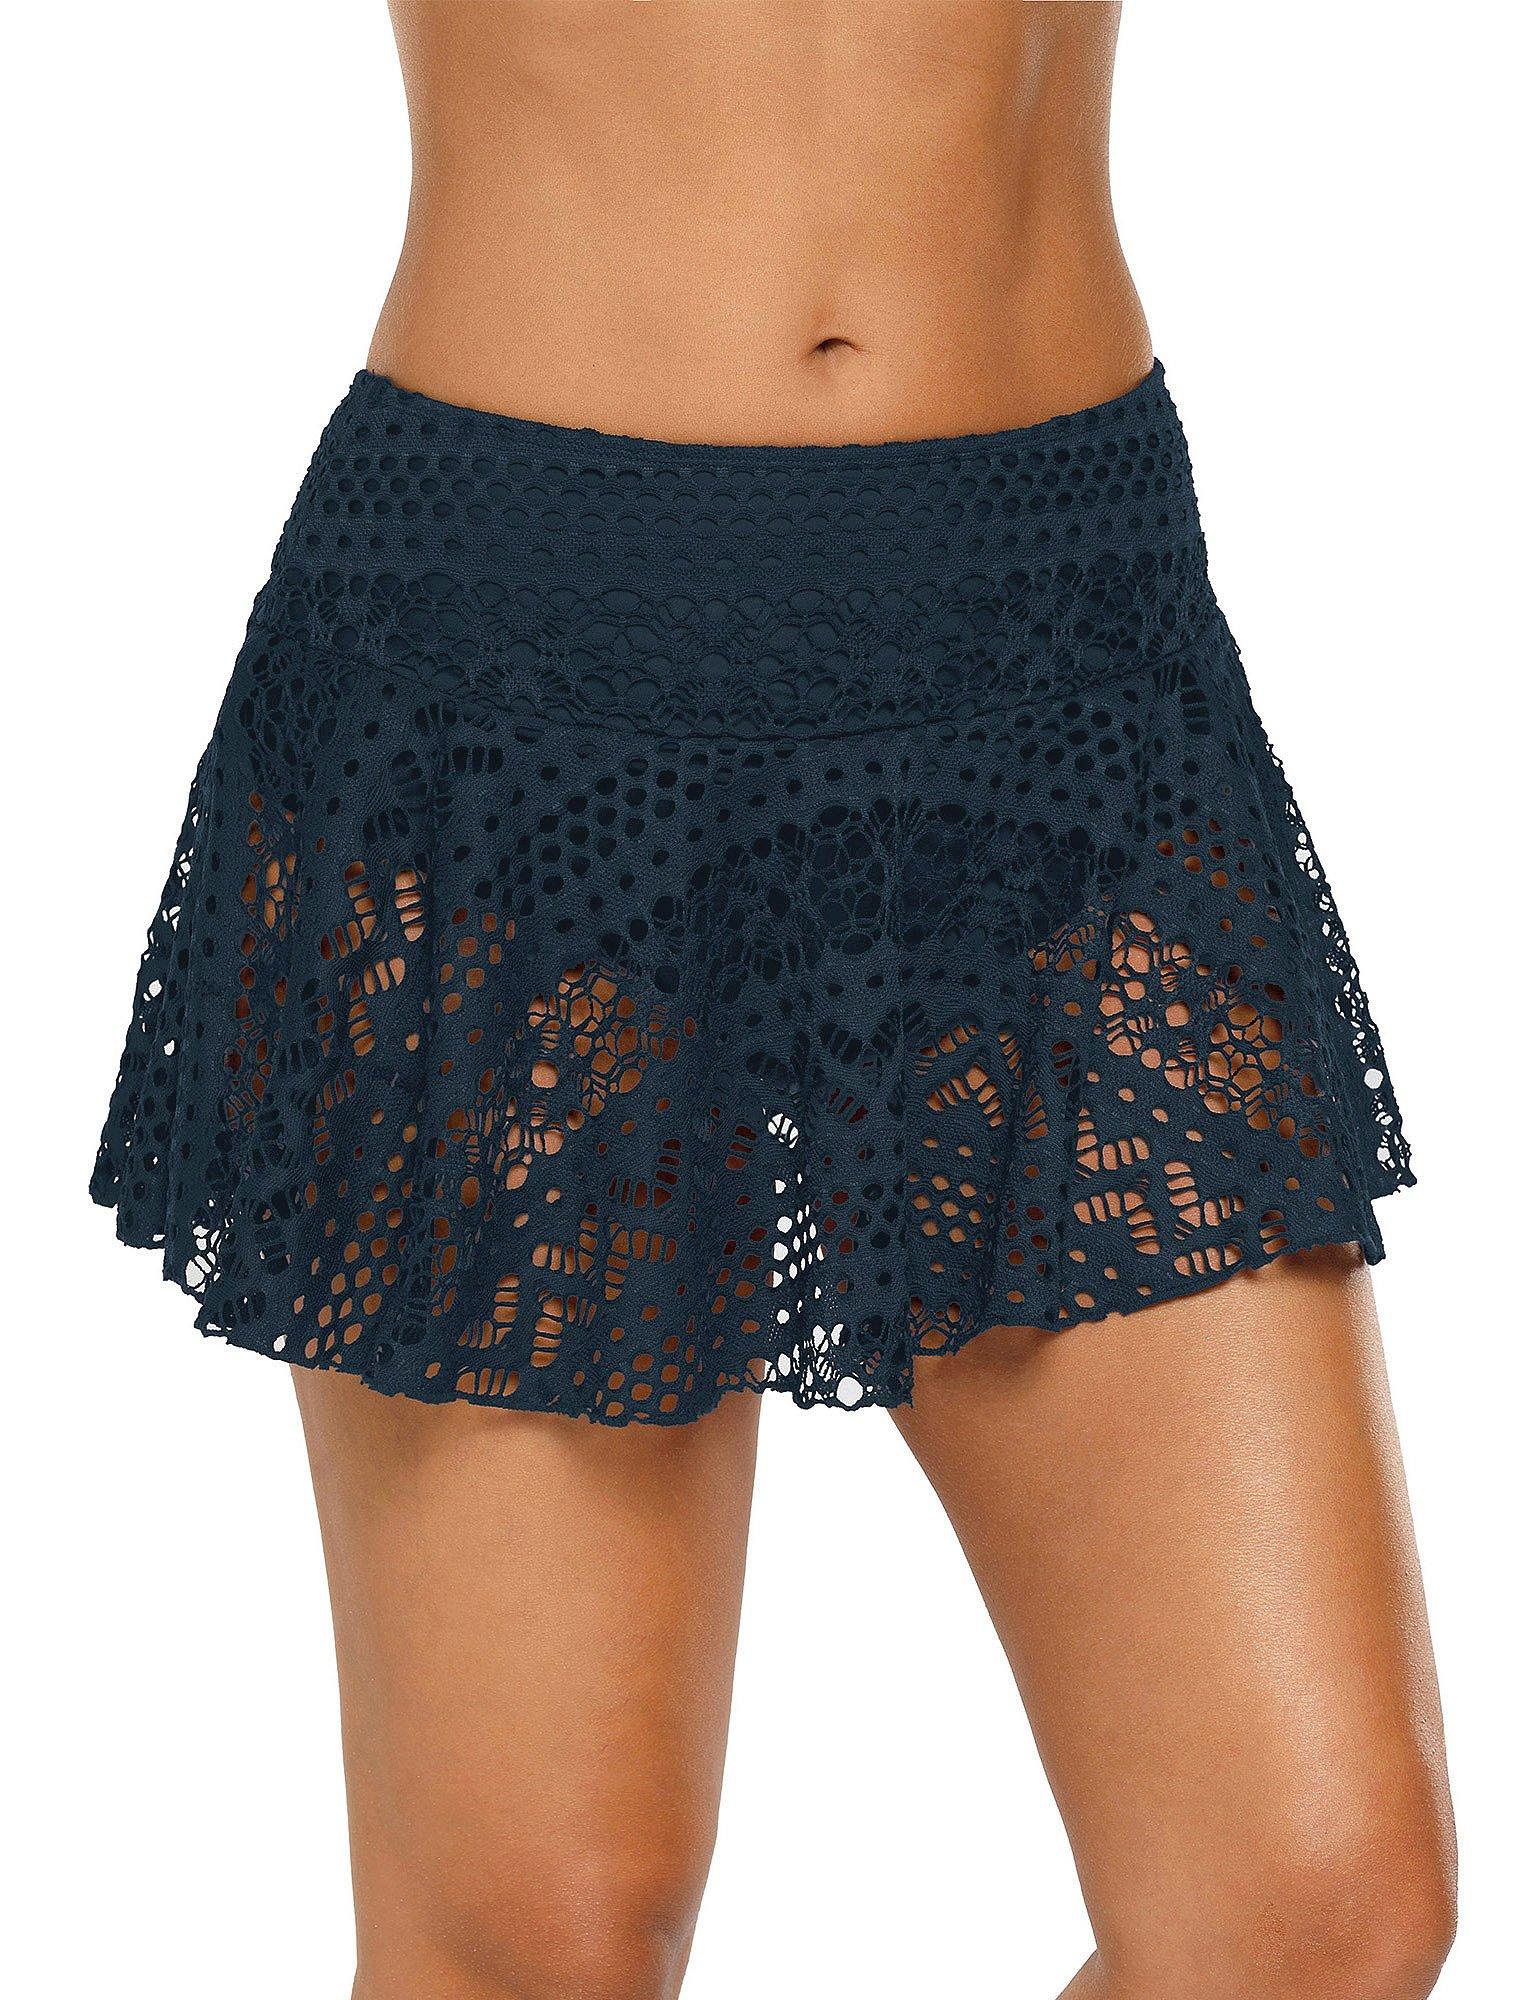 ACKKIA Women's Navy Lace Crochet Skirted Bikini Bottom with Brief Solid Short Swim Skirt Swimsuit Size XL